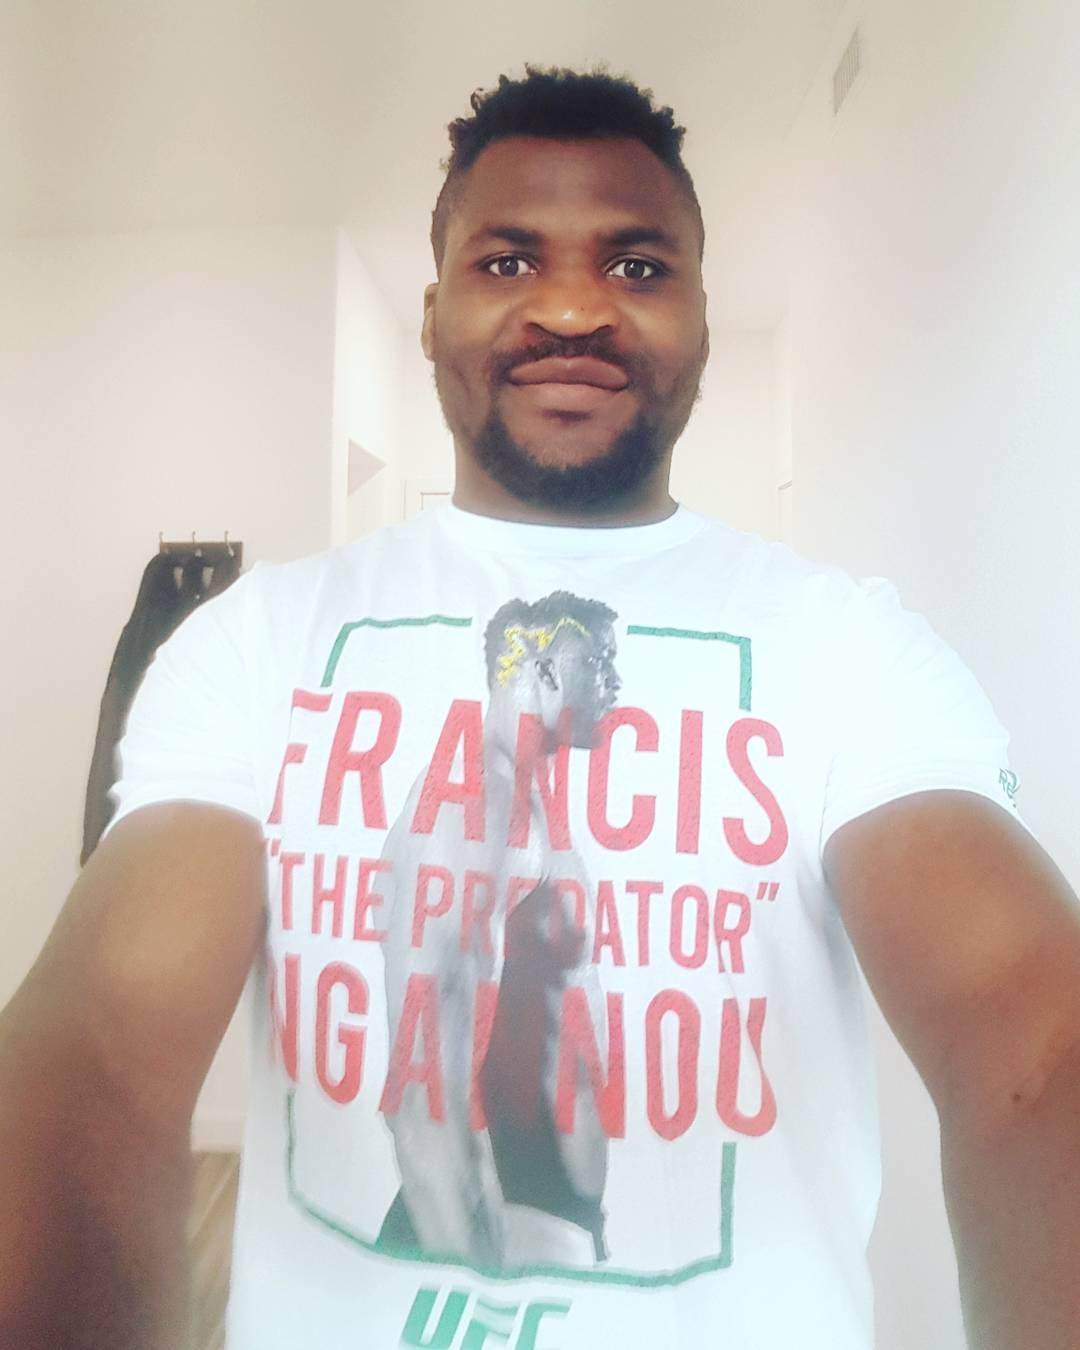 Francis Ngannou Instagram username